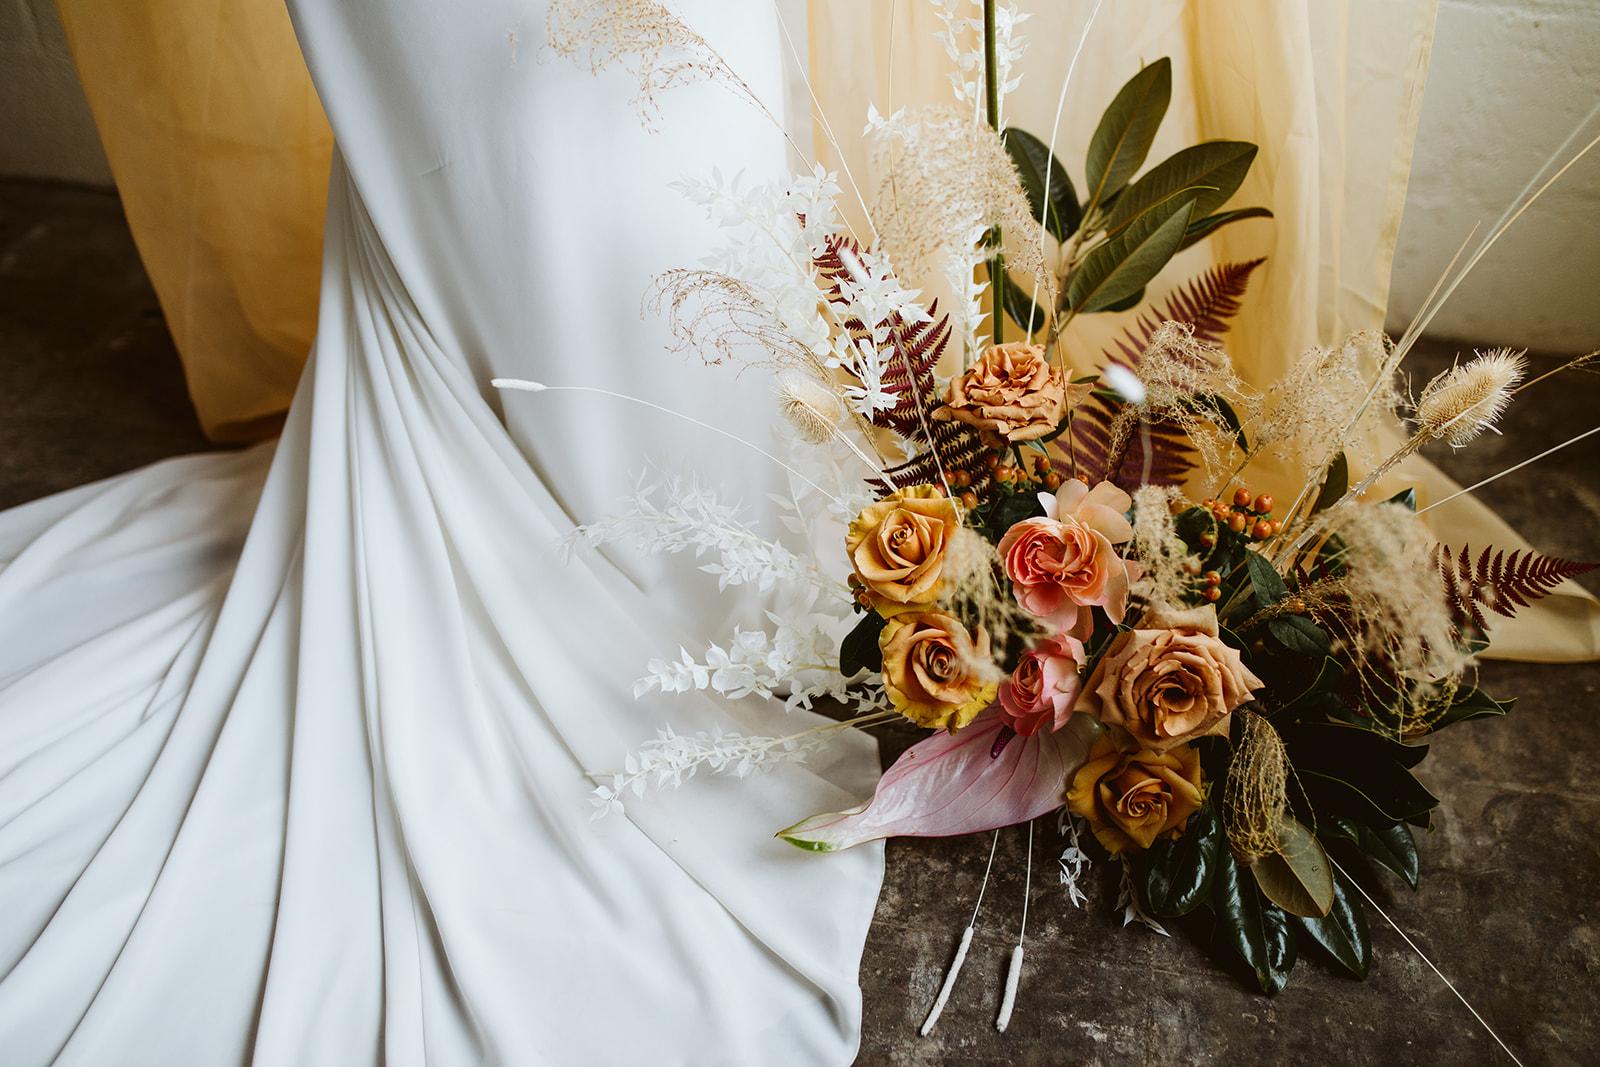 train details. wedding bouquet. elopement bouquet. unique florals. stunning wedding. adventurous bouquet. satin wedding gown. simple wedding gown. wildflowers and roses. stunning wedding dress. magical bouquet.